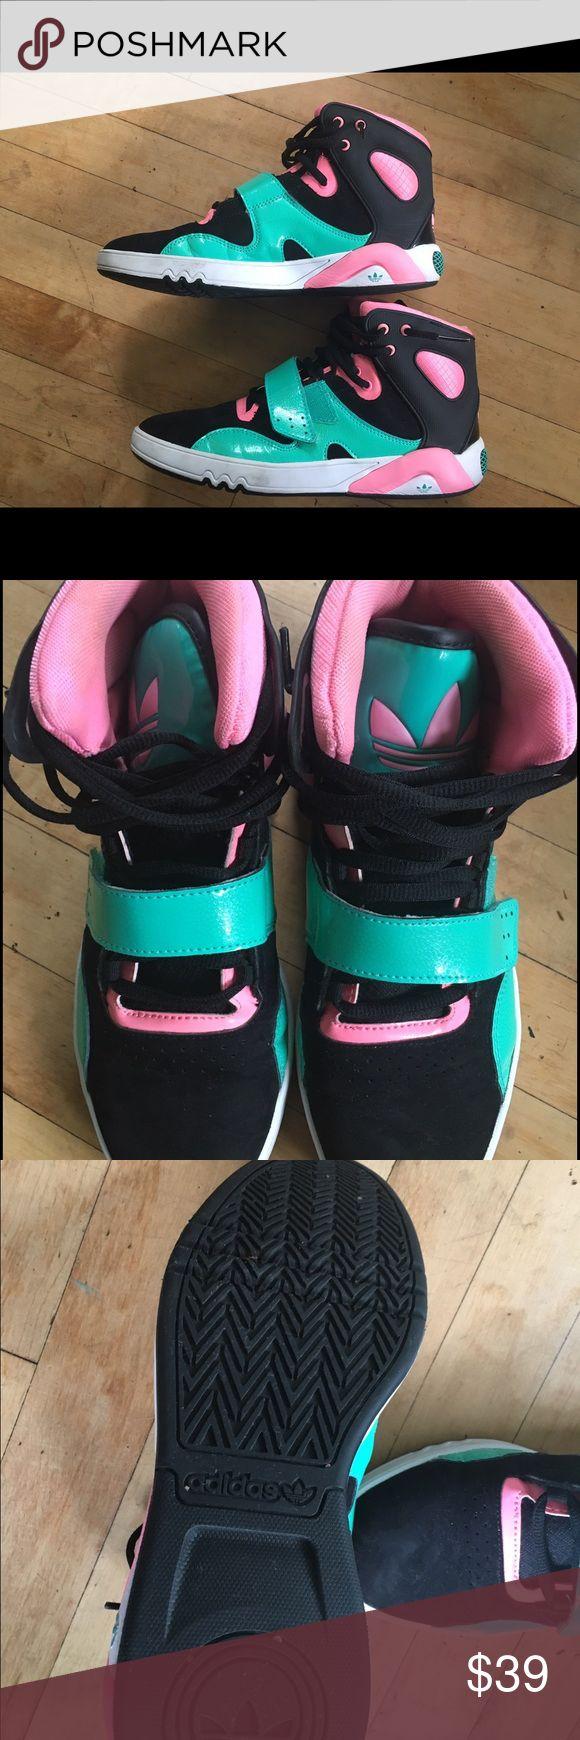 Adidas high tops worn once indoors Adidas high tops worn once indoors Adidas Shoes Athletic Shoes